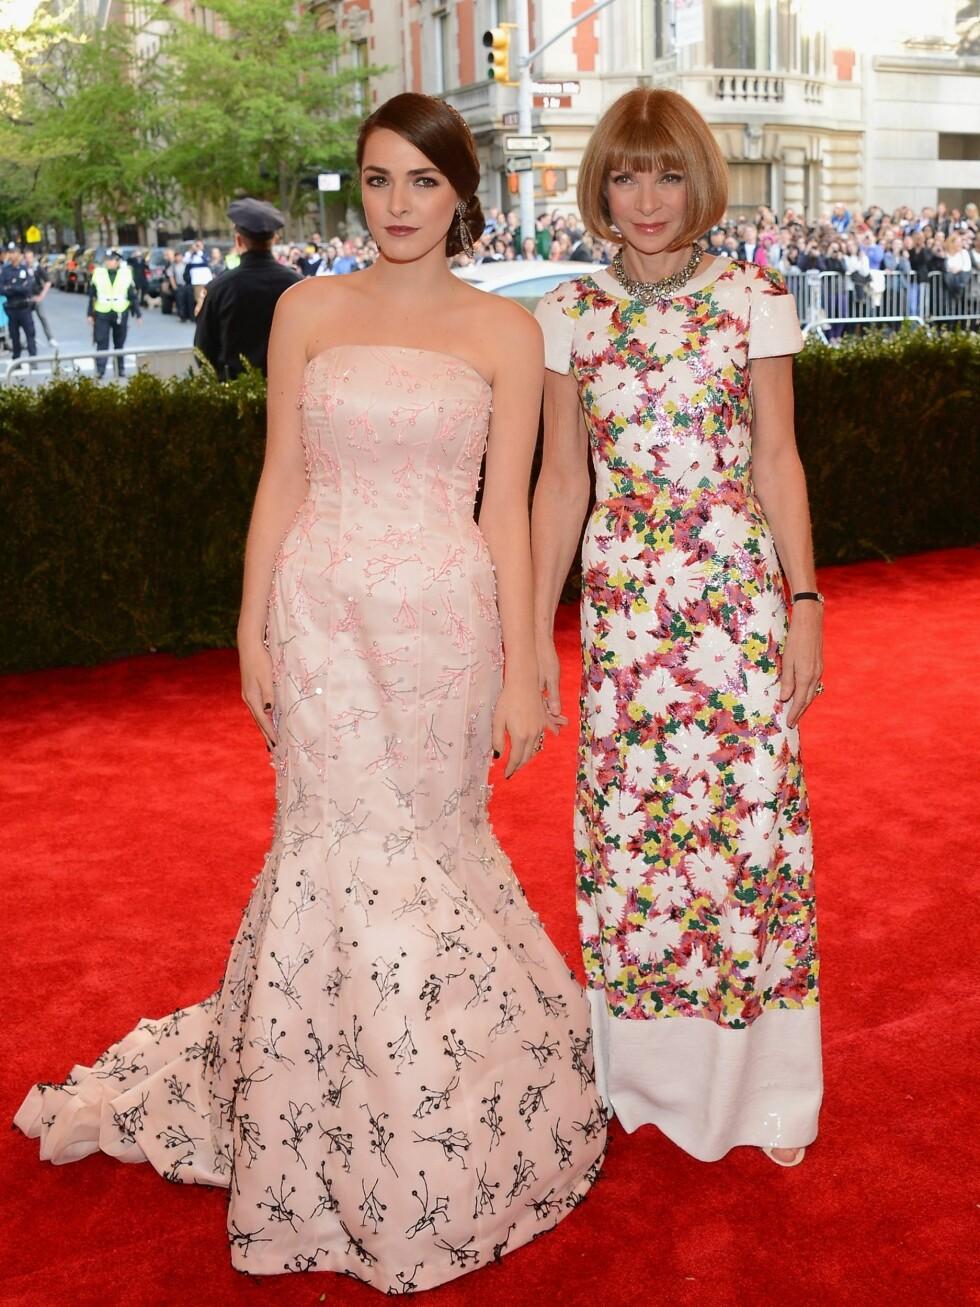 Anna Wintour og datteren Bee Shaffer Foto: All Over Press